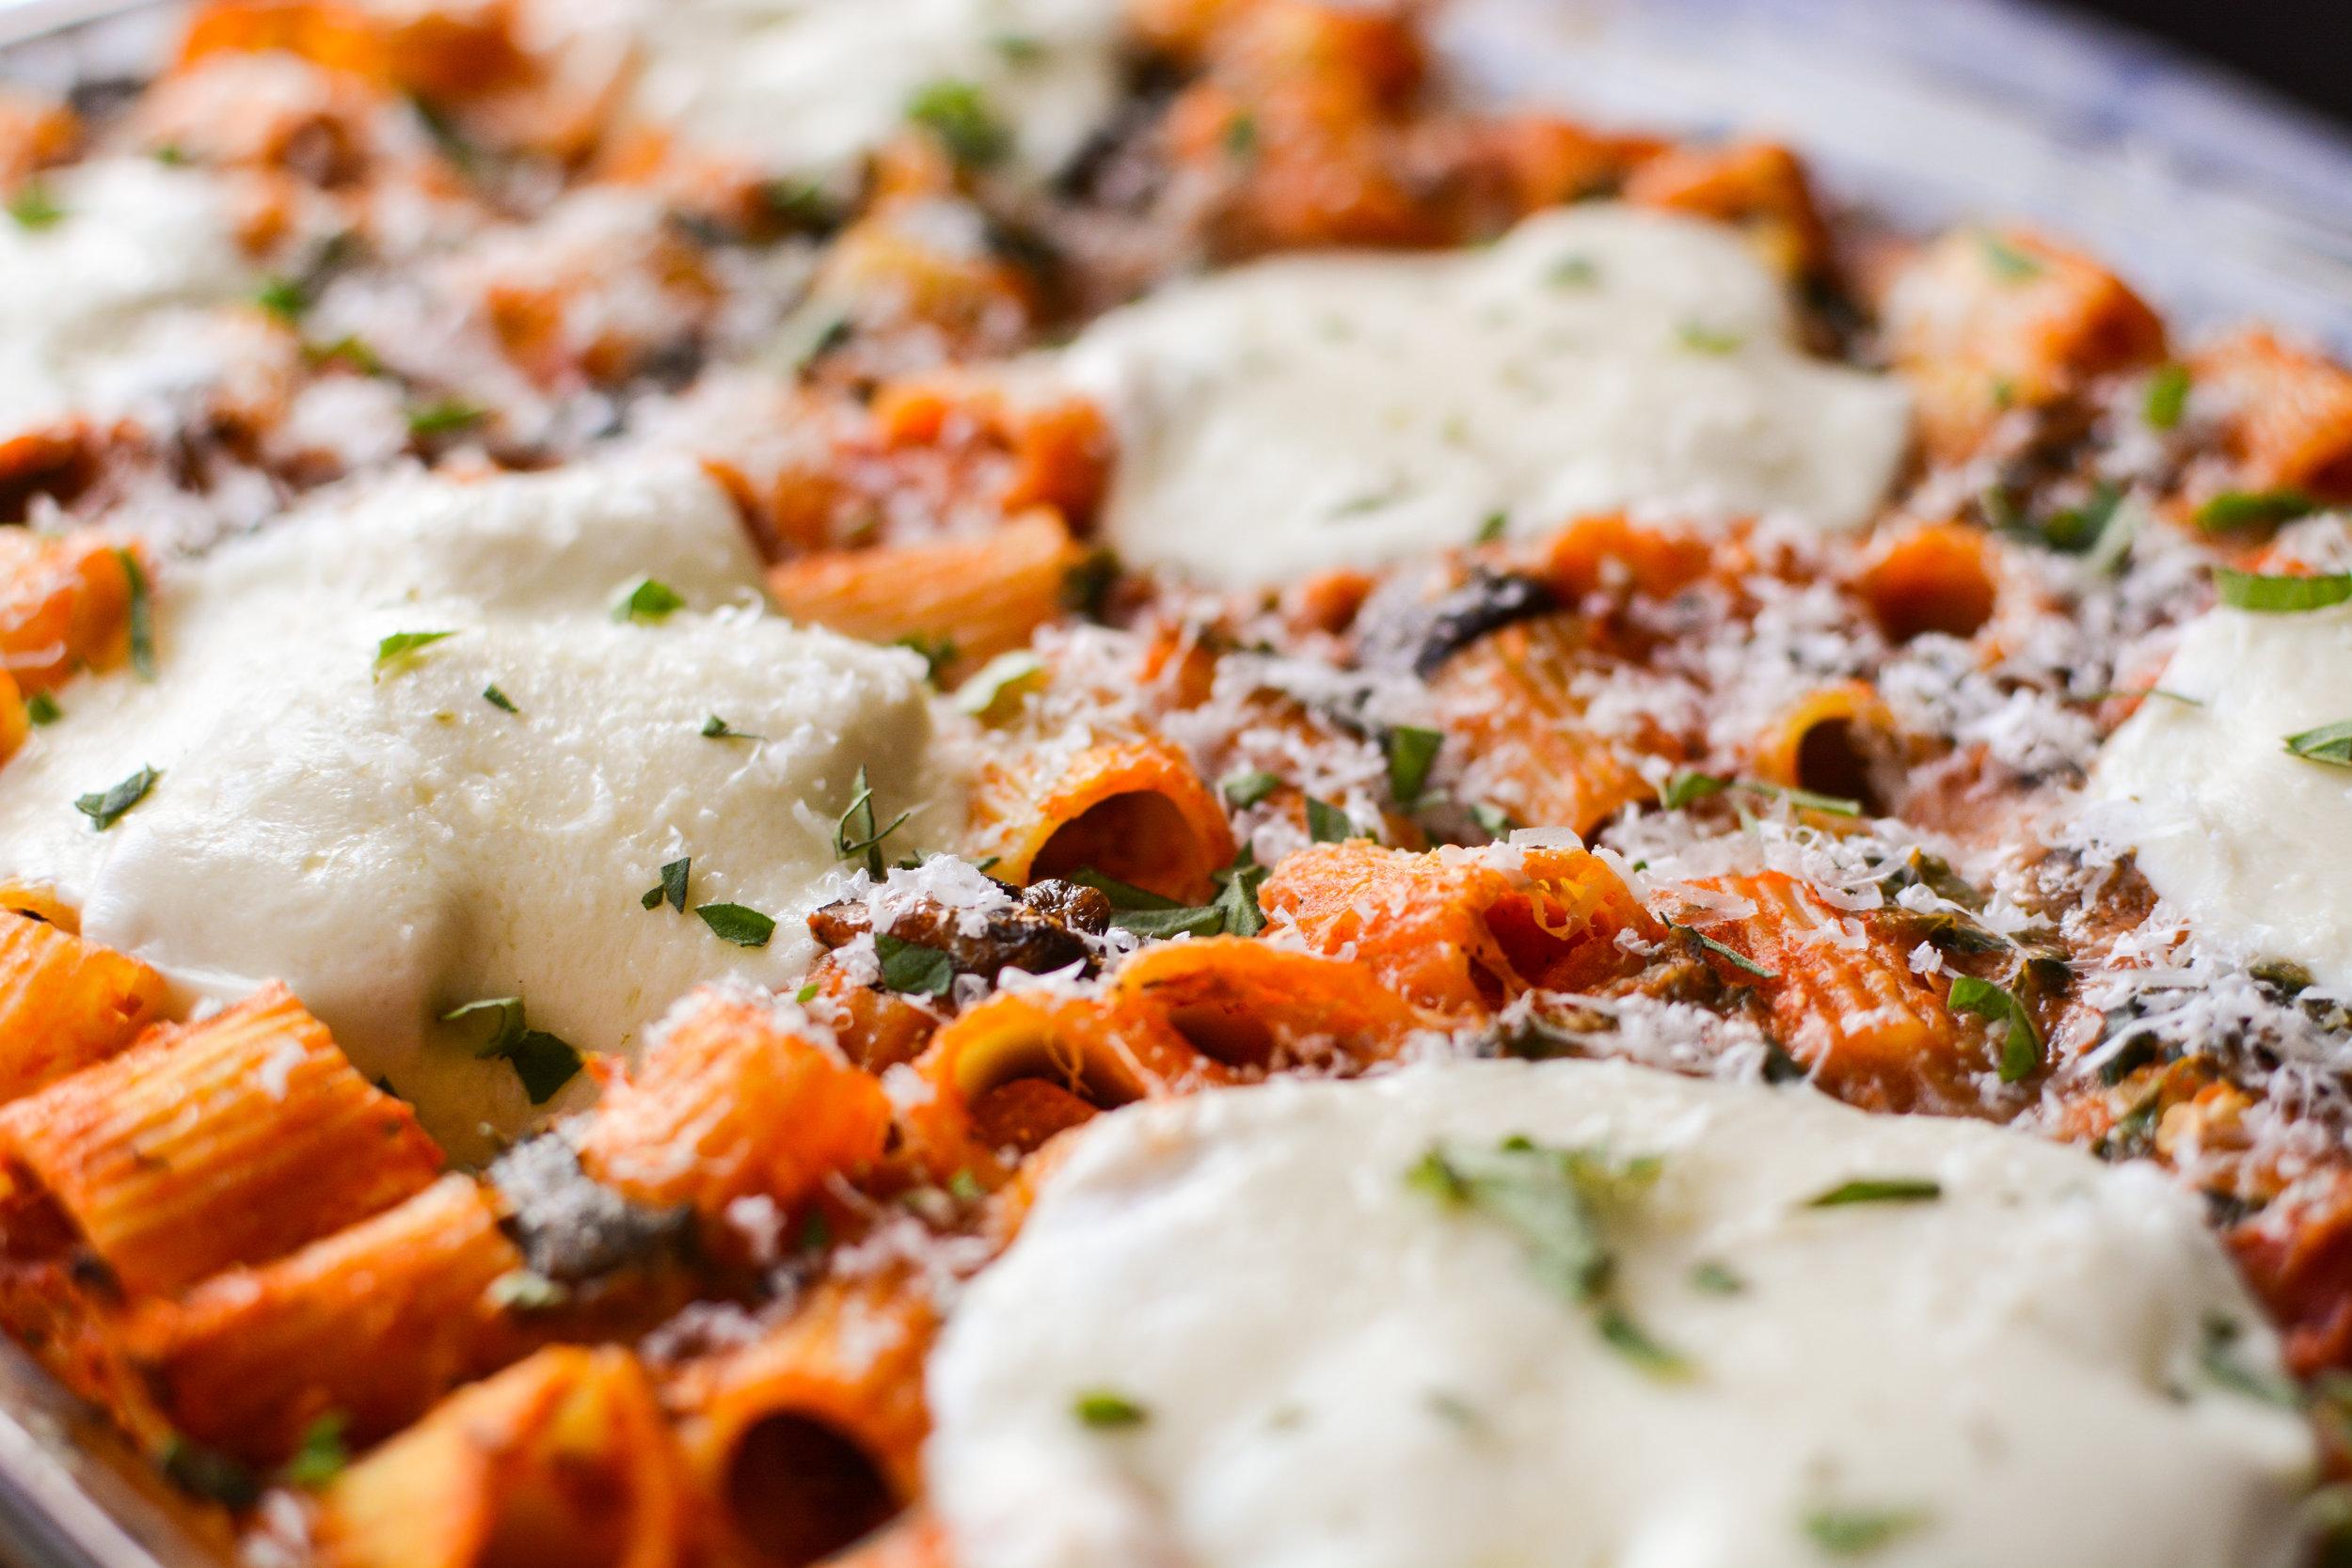 Vegetable Pasta Bake - Kristin's Kitchen